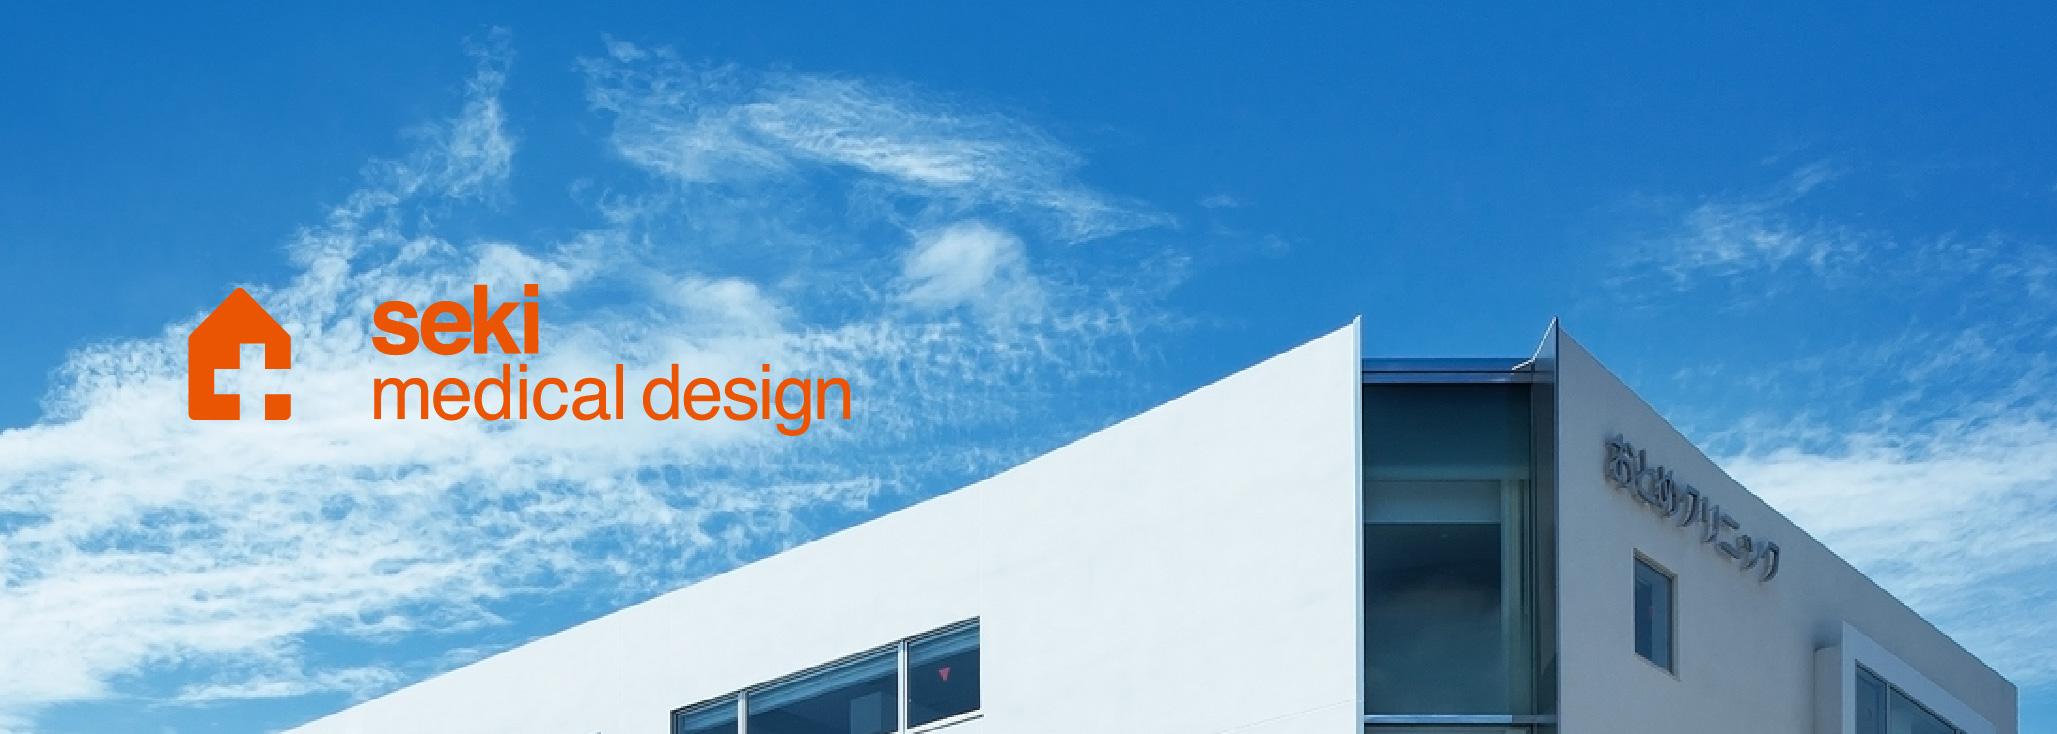 Seki Medical Design